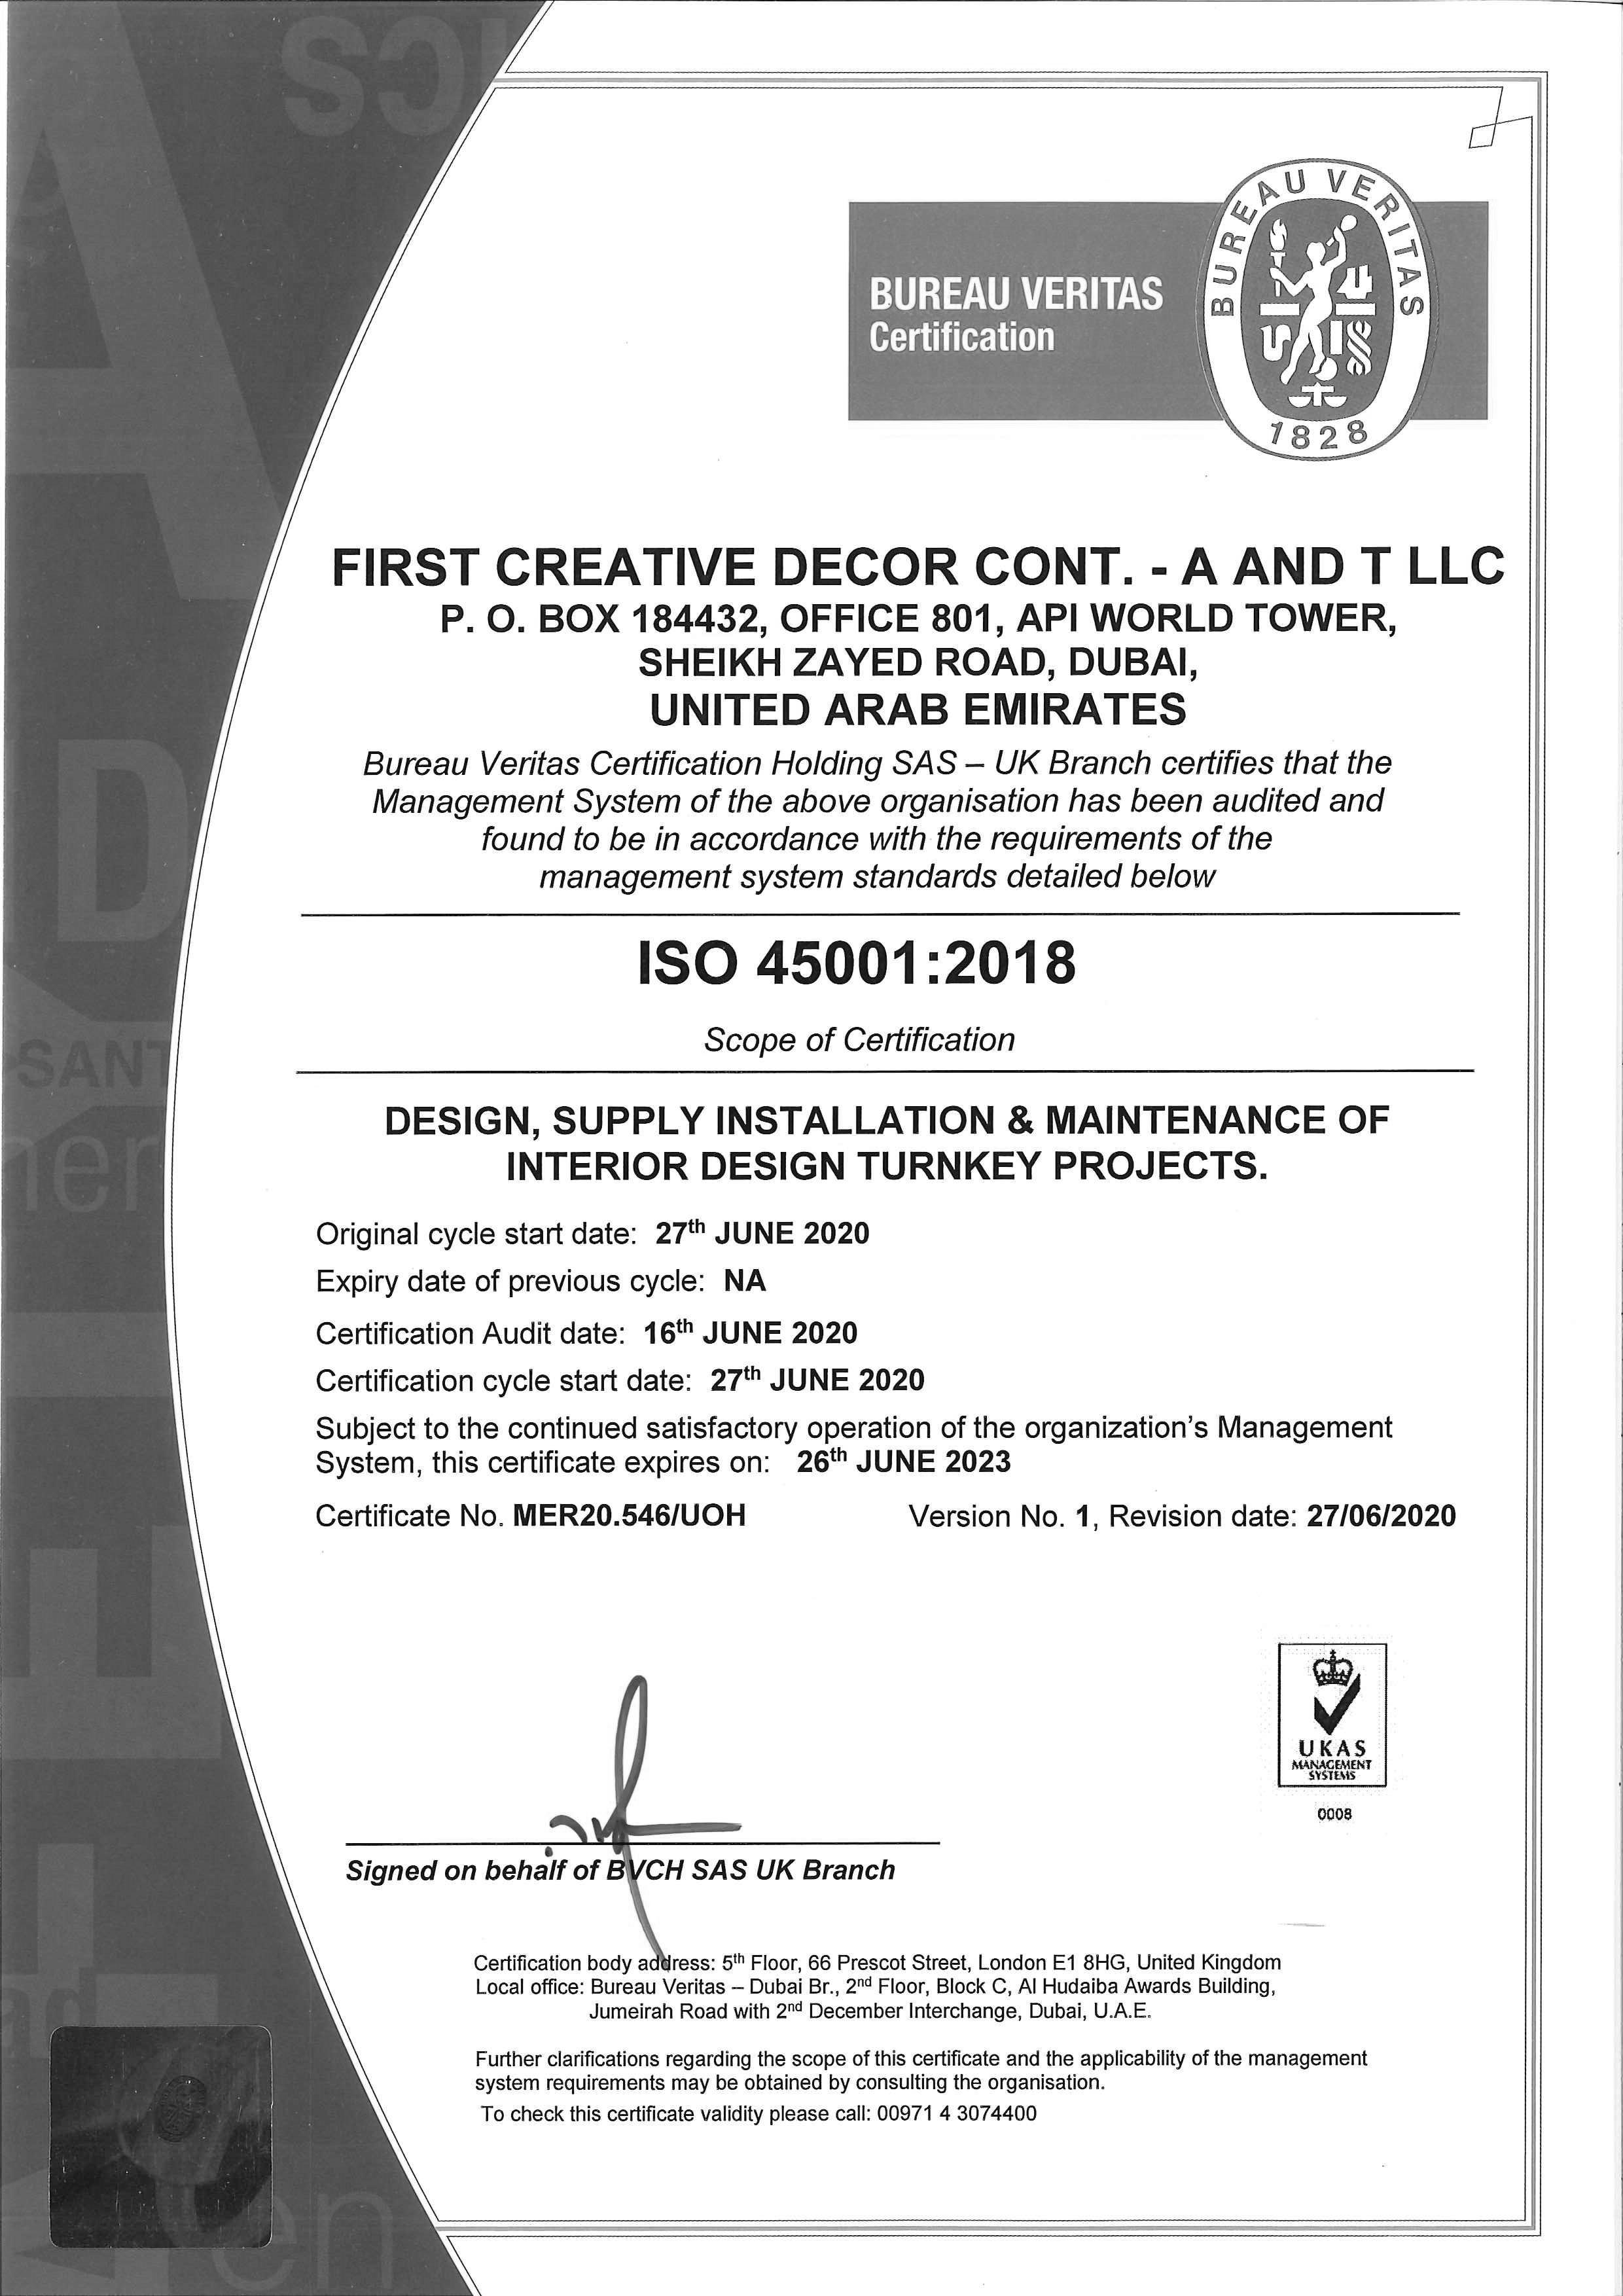 Interior Fit Out Contractors in Dubai - ISO 45001:2015